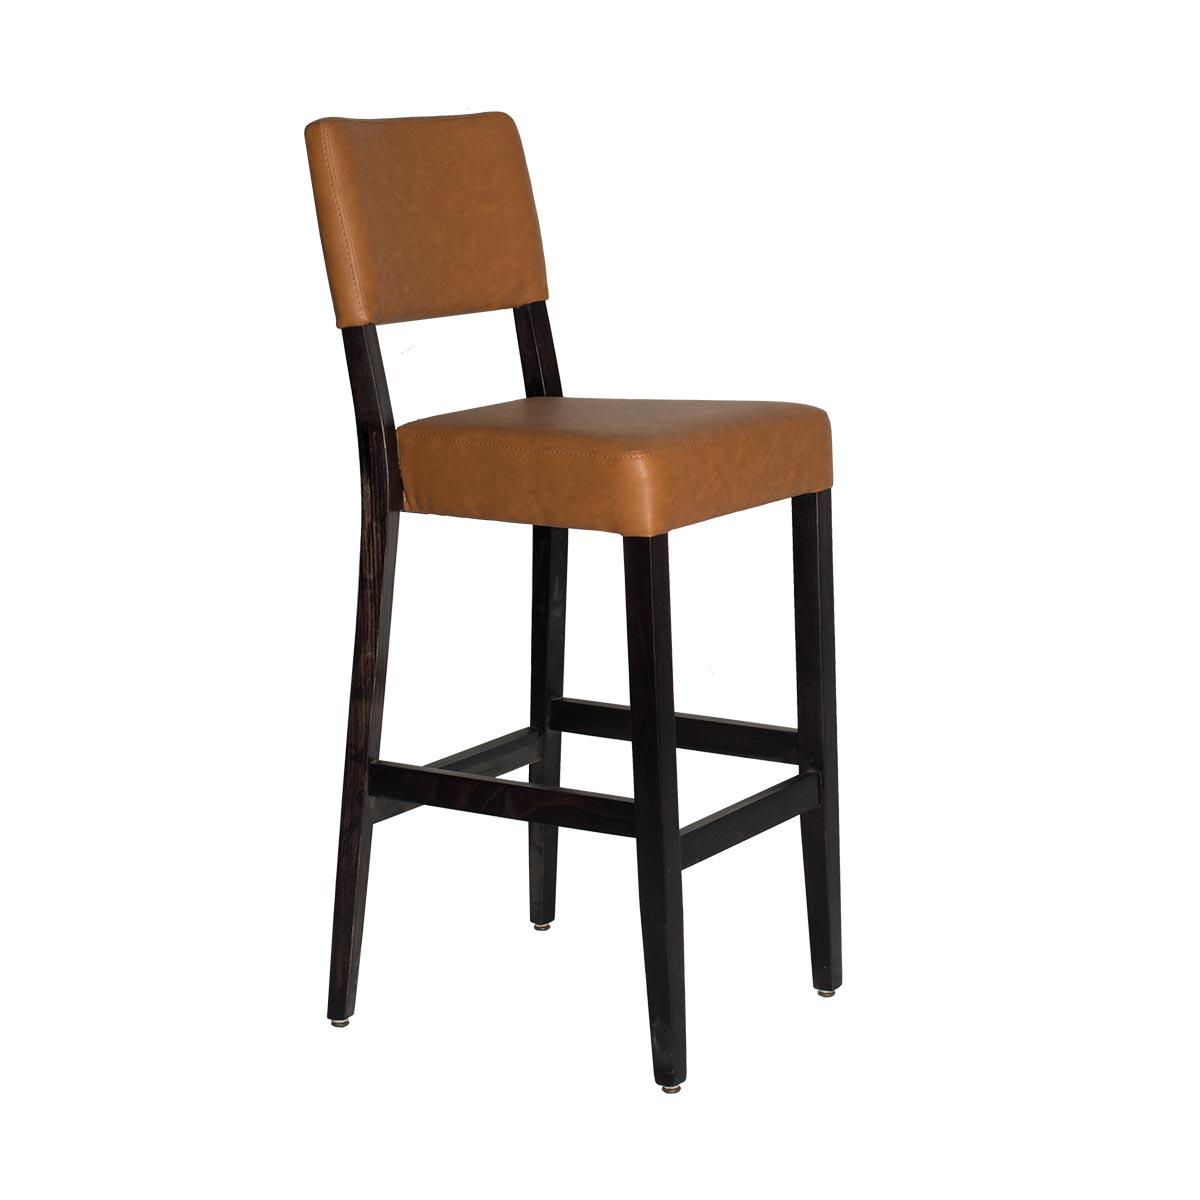 Linn Bar - Barska stolica - Detal nameštaj